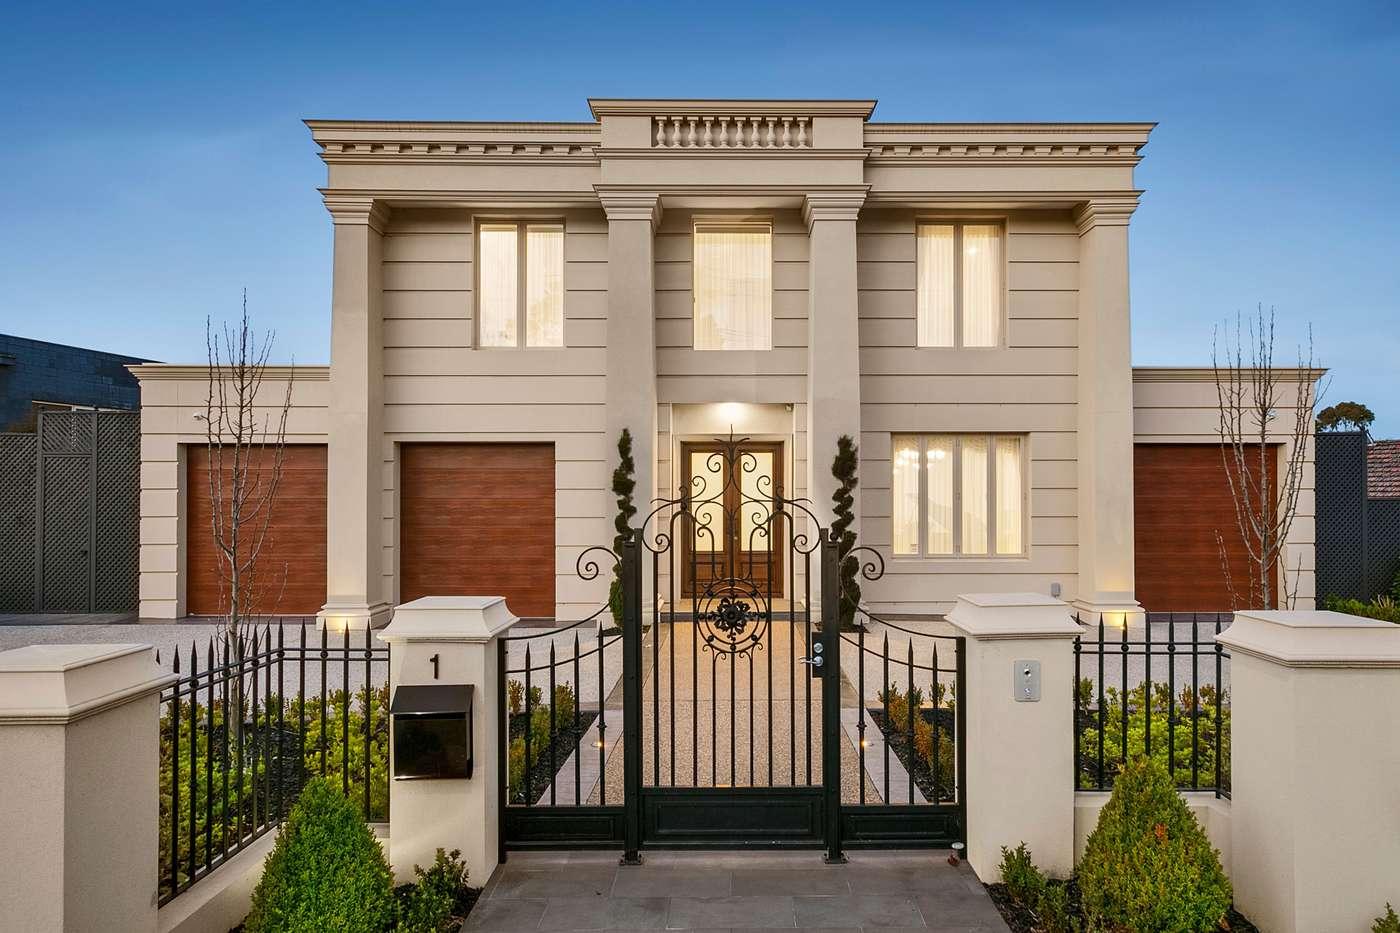 Main view of Homely house listing, 1 Harrington Avenue, Balwyn North, VIC 3104